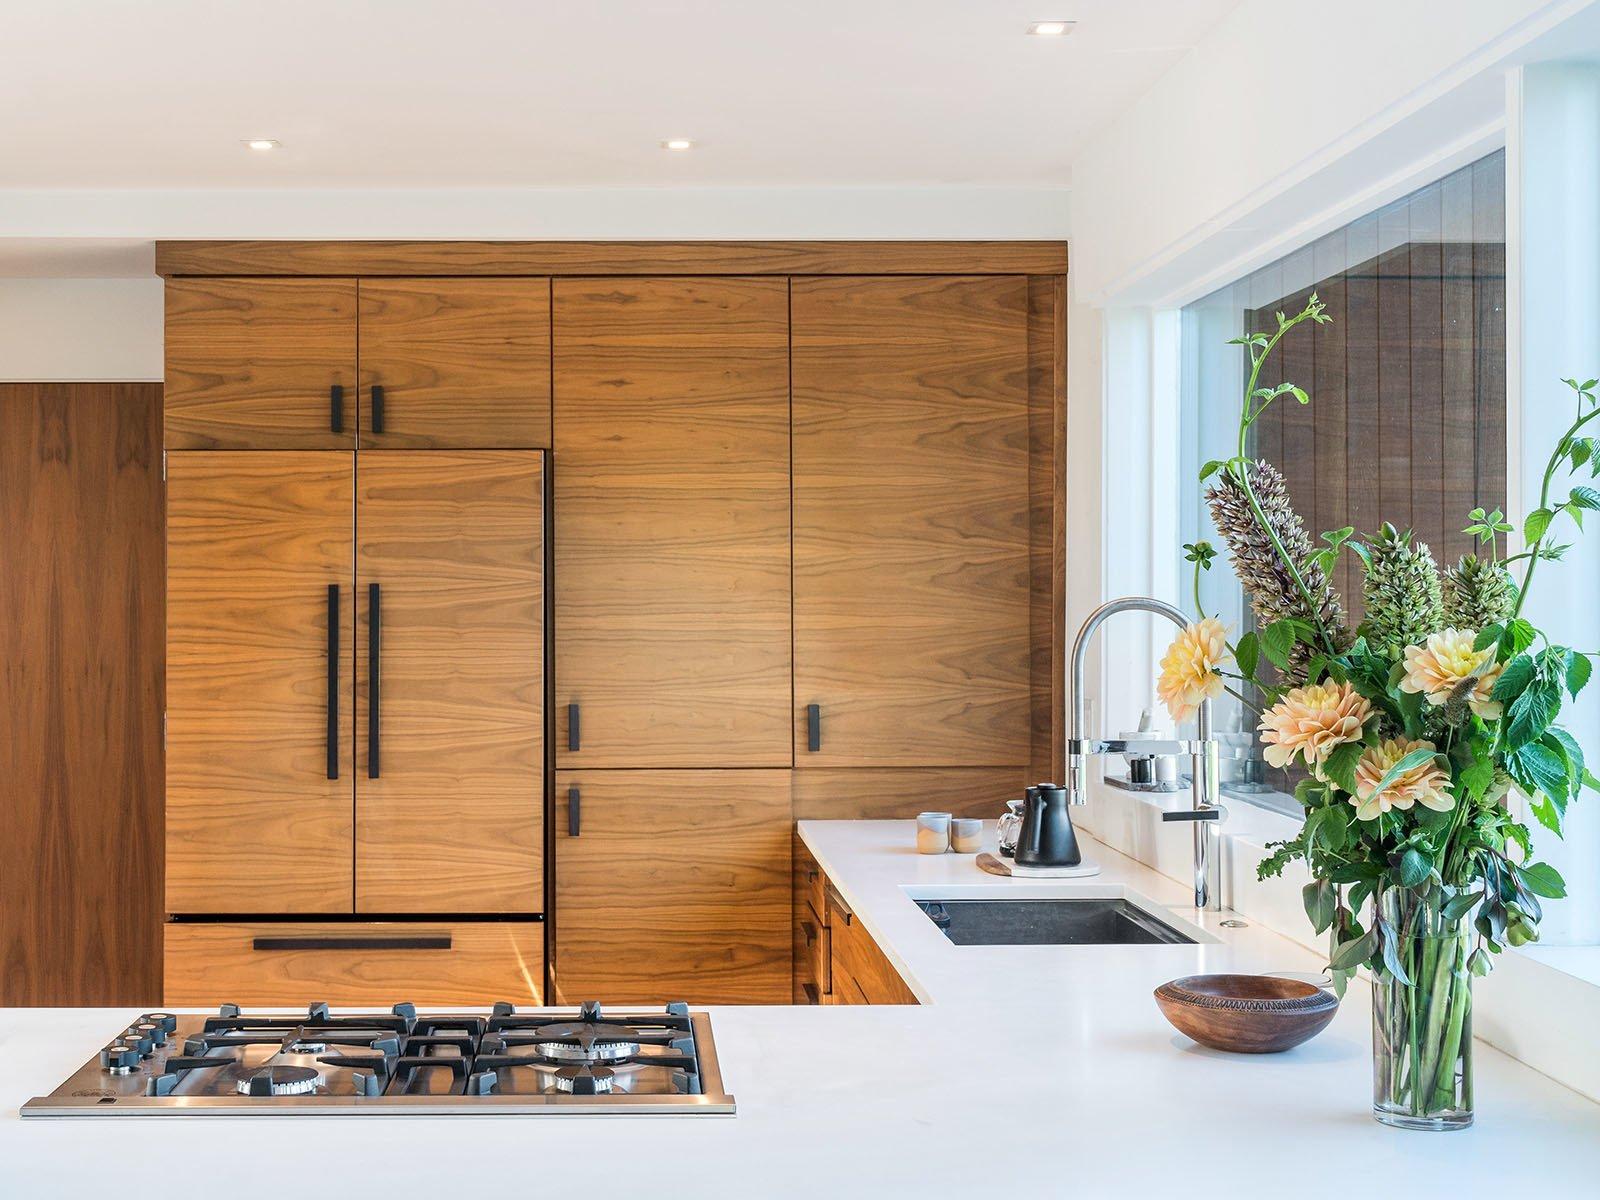 Sinclair House kitchen walnut cabinets